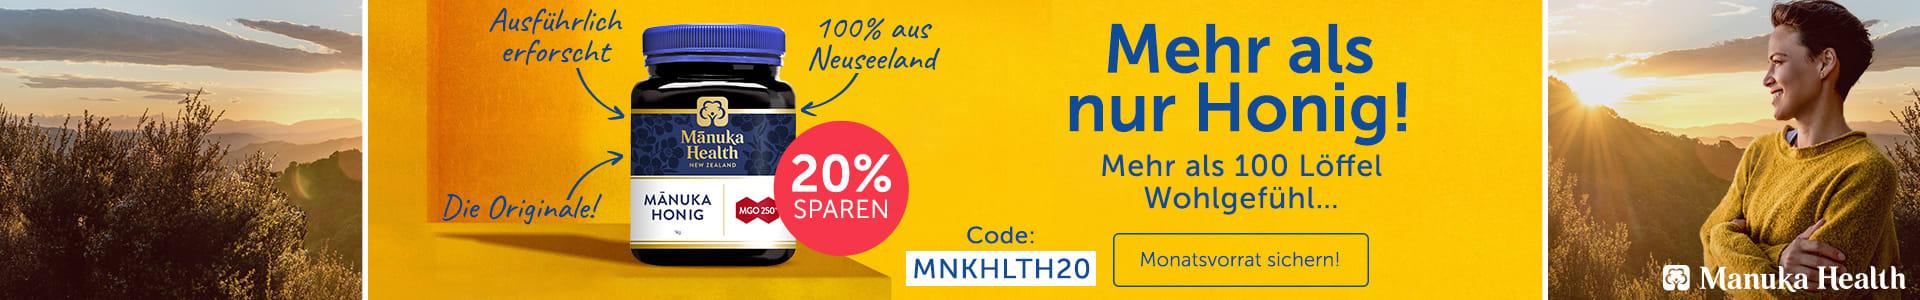 Jetzt 20% auf Manuka Health!